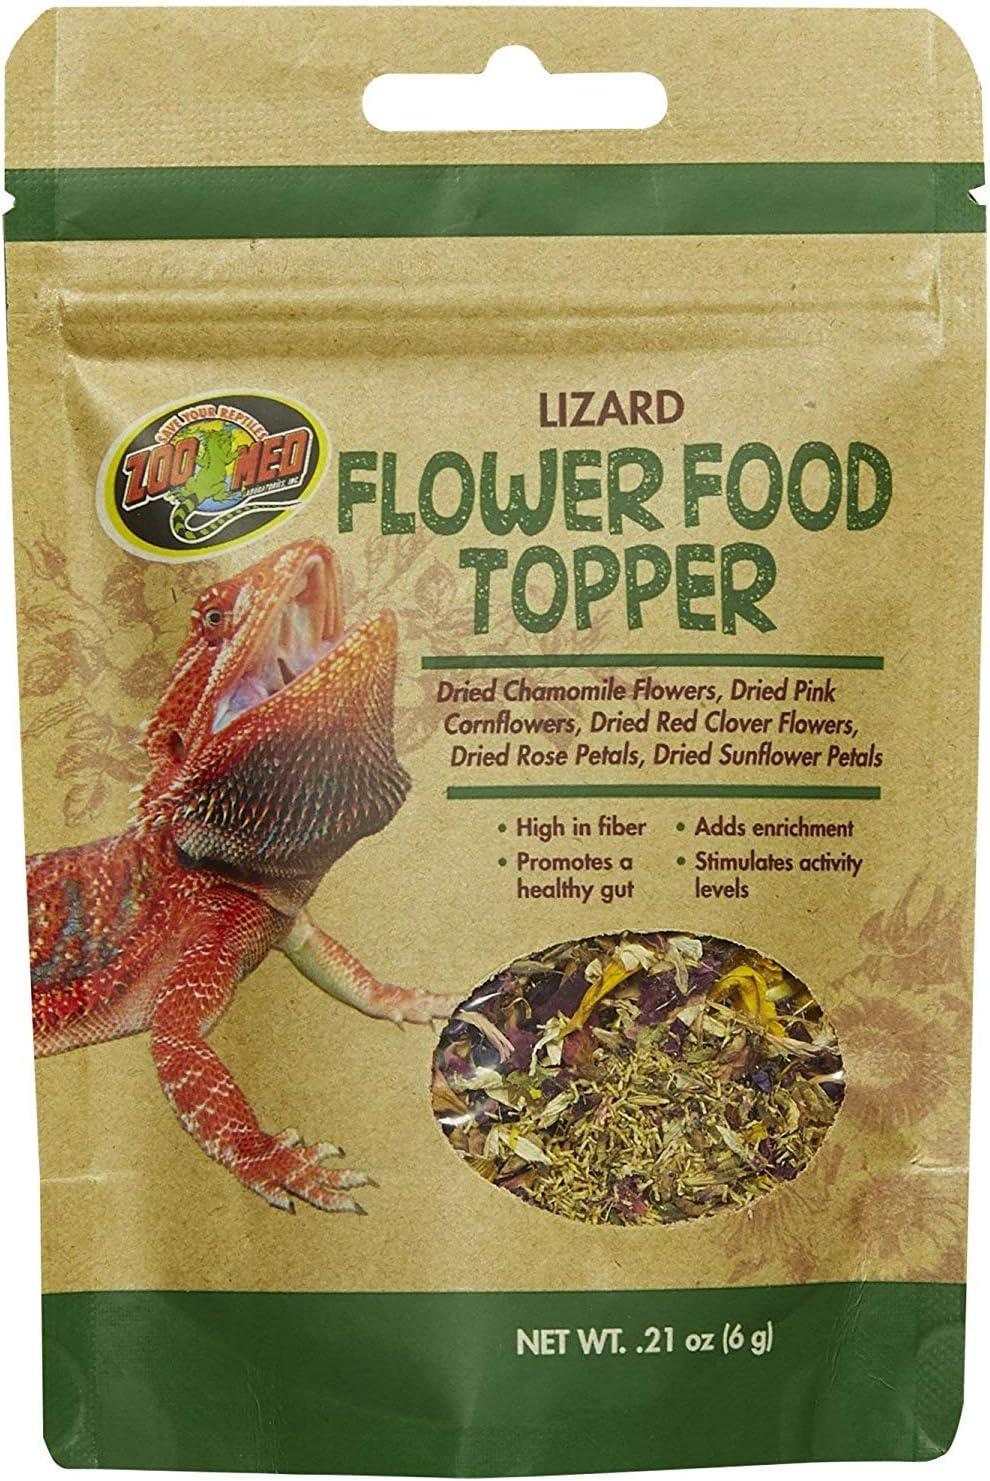 Zoo Med Lizard Flower Food Topper 0.21 oz - Pack of 2